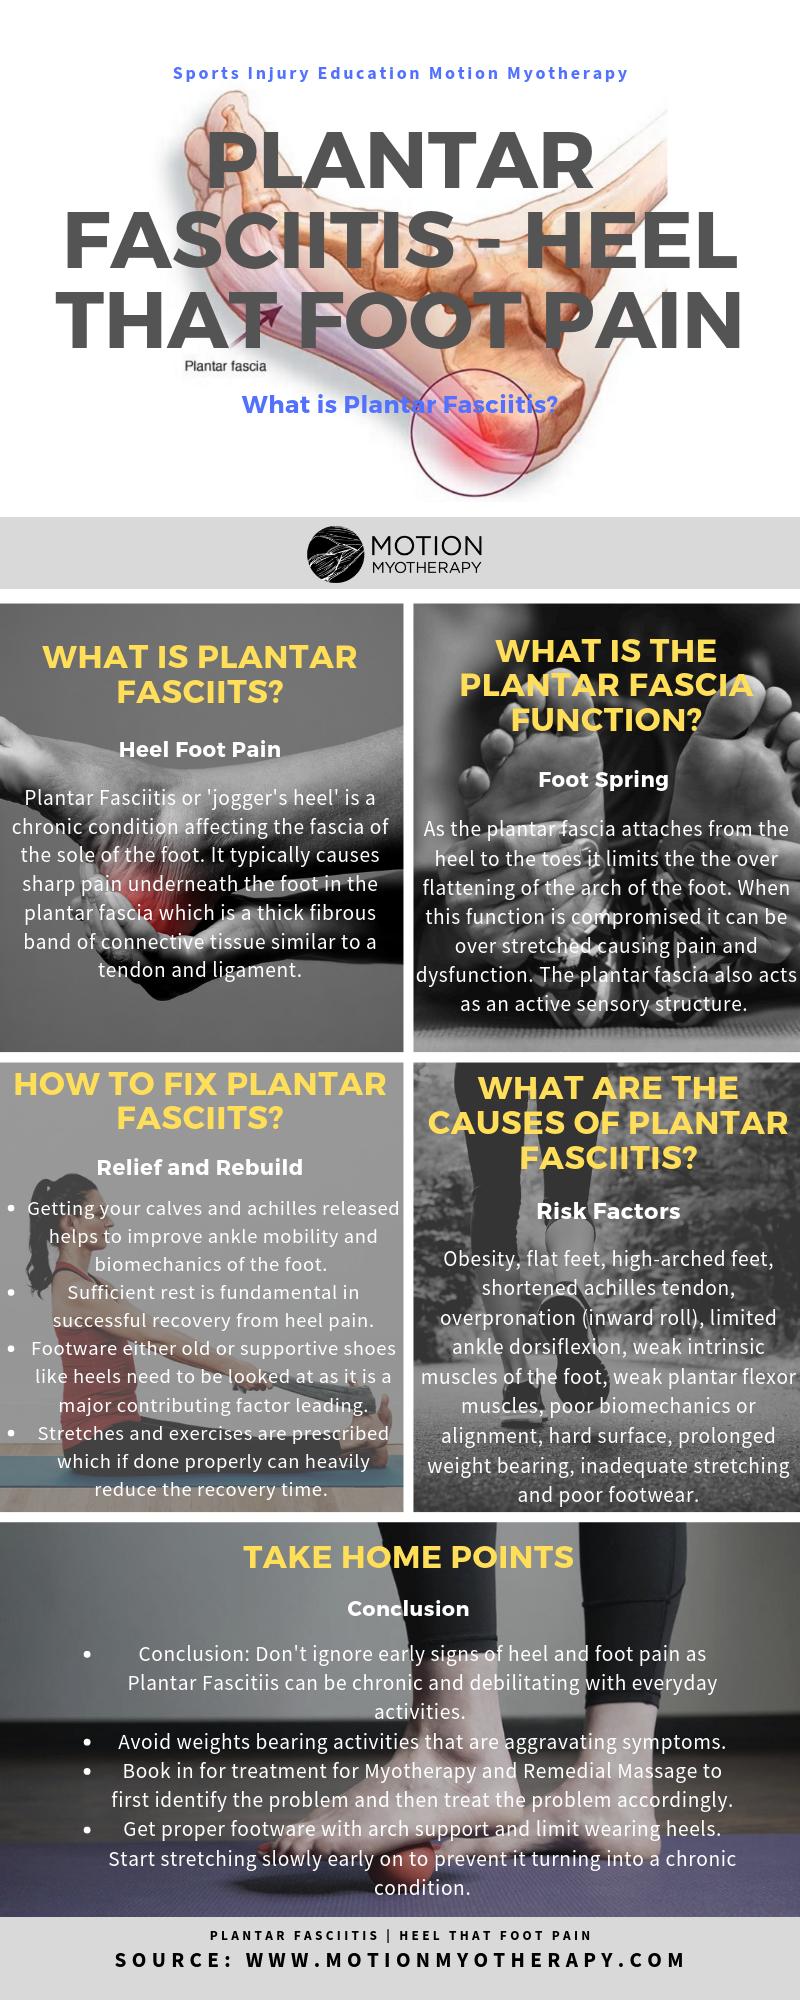 Plantar Fasciitis Heel That Foot Pain